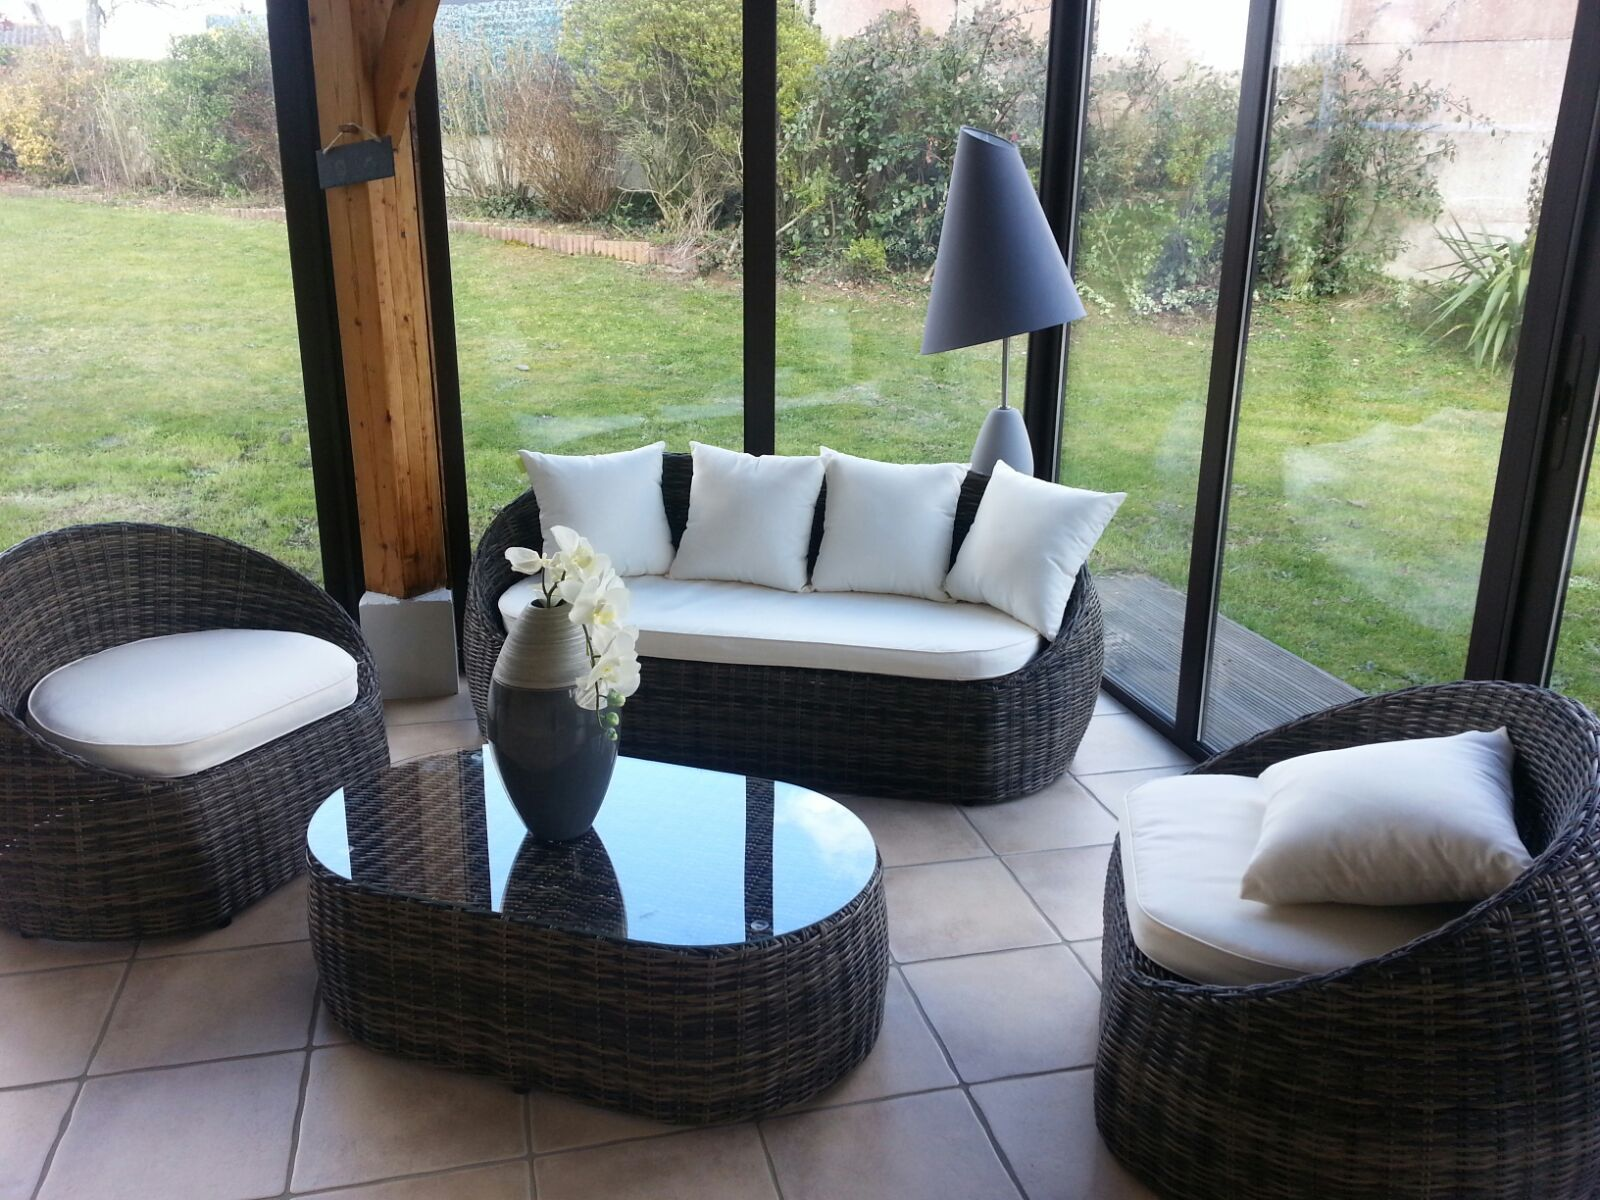 Ritardo salon de jardin 4 places en r sine tress e d co - Mobilier de jardin resine tressee ...